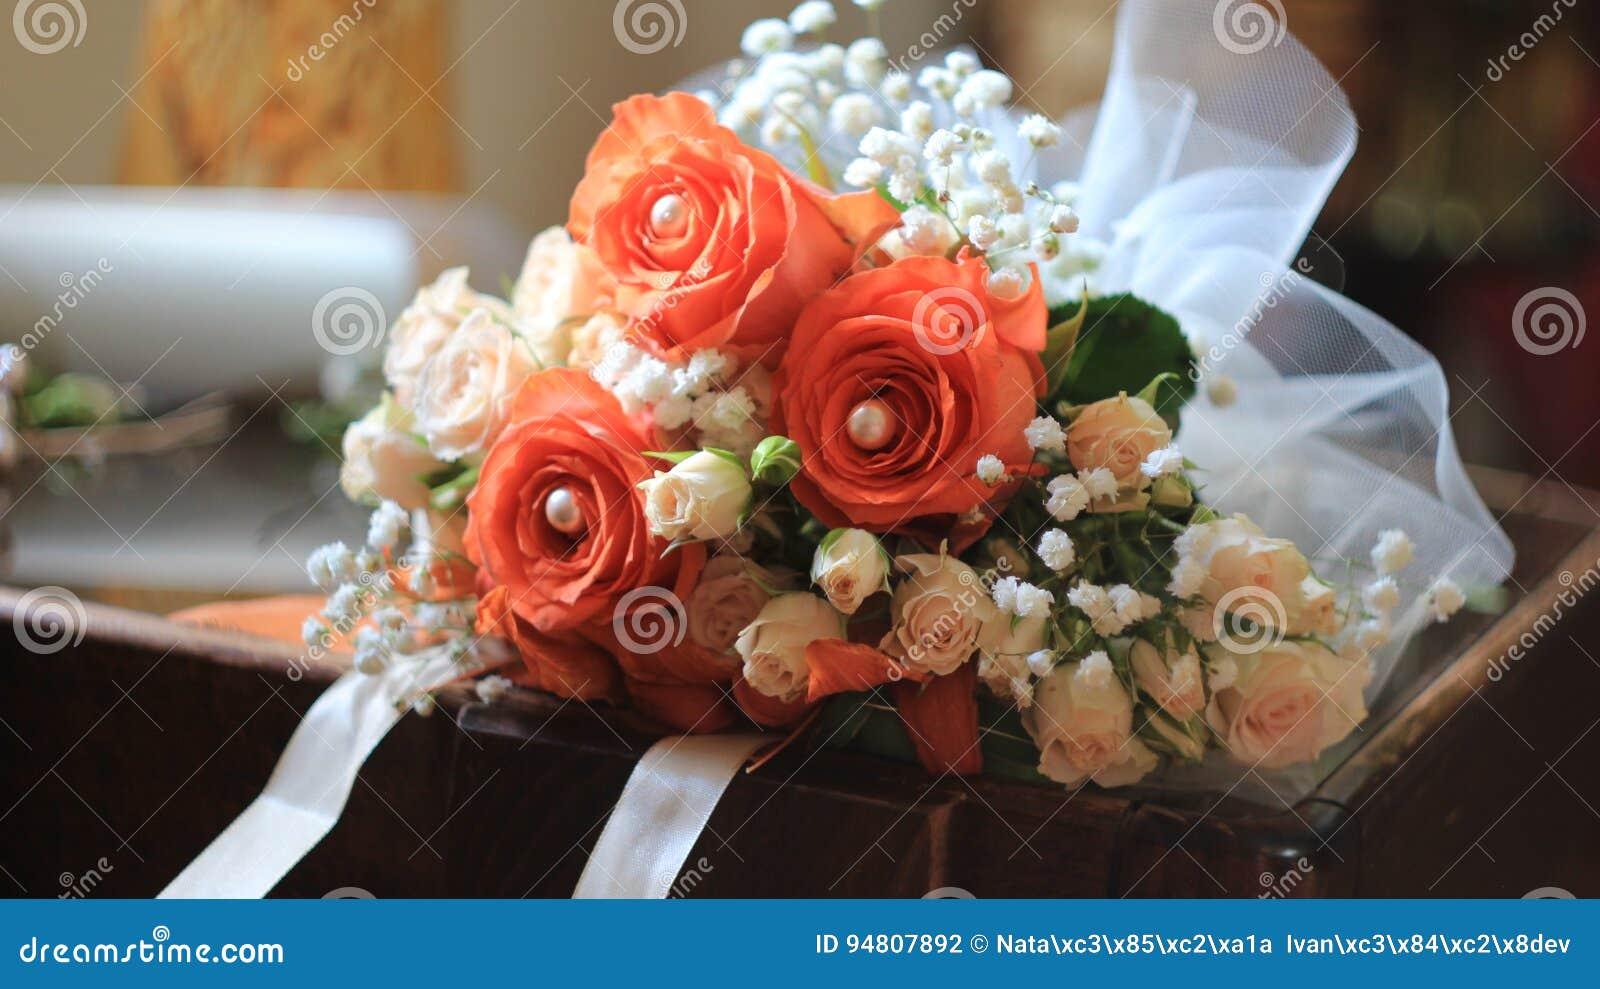 Wonderful Wedding Bouquet With Orange Rosesliliespearlswhite